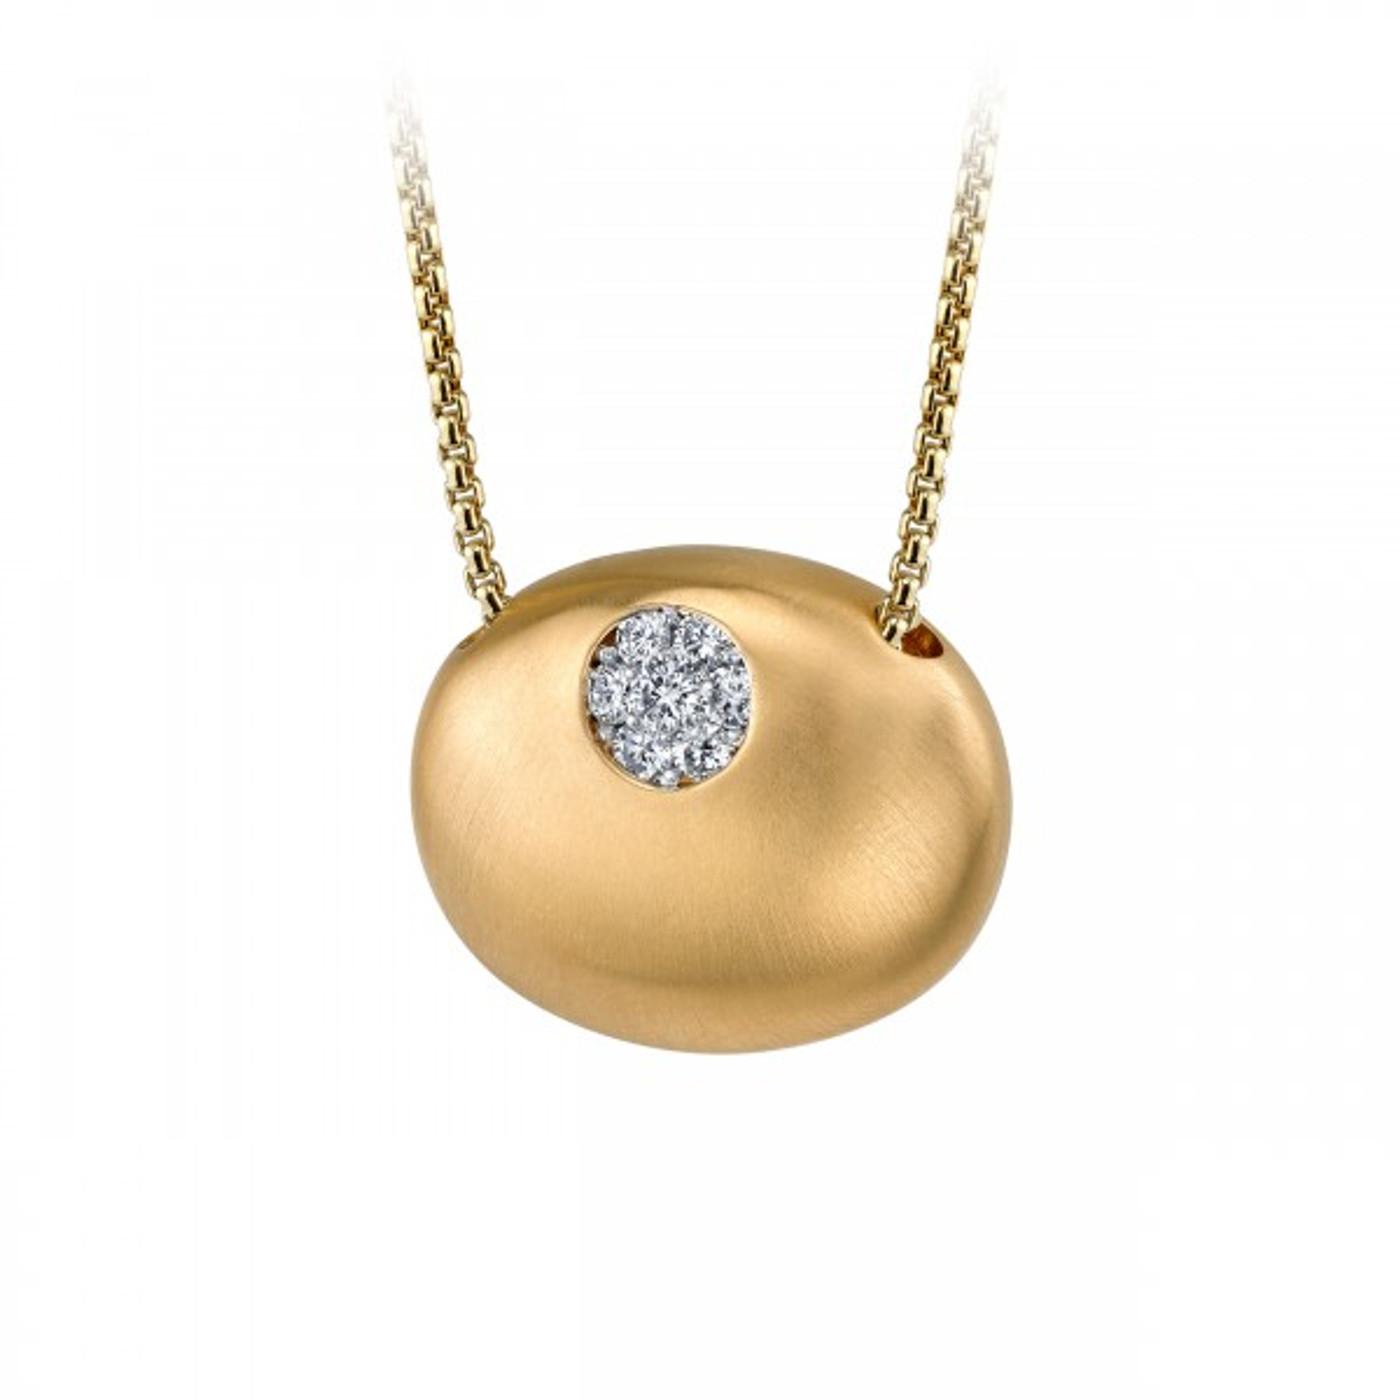 14 Karat Yellow Gold Small Oval & Diamond Necklace .10 DTW